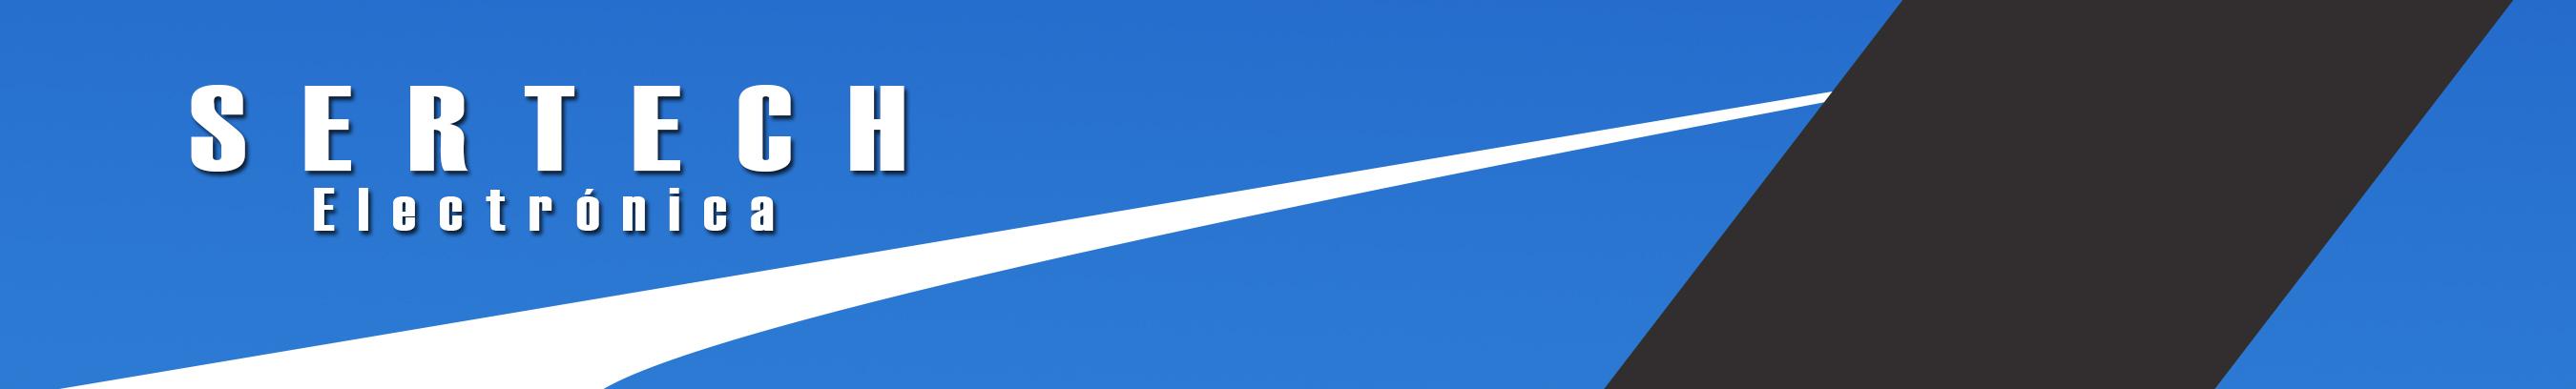 Logo realizado por SERTECH ELECTRONICA